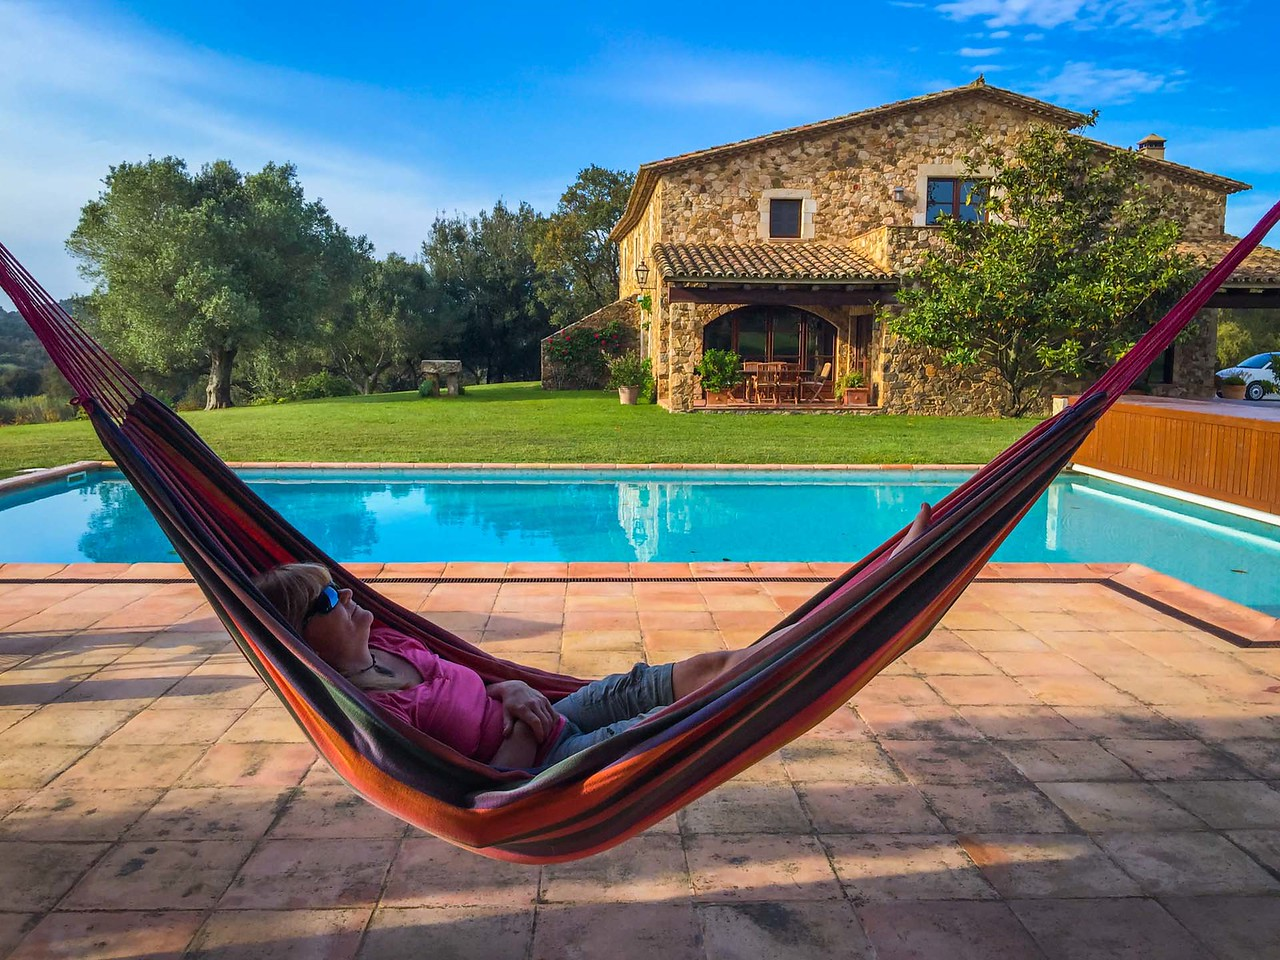 Relaxing in our Luxury Villa in spain